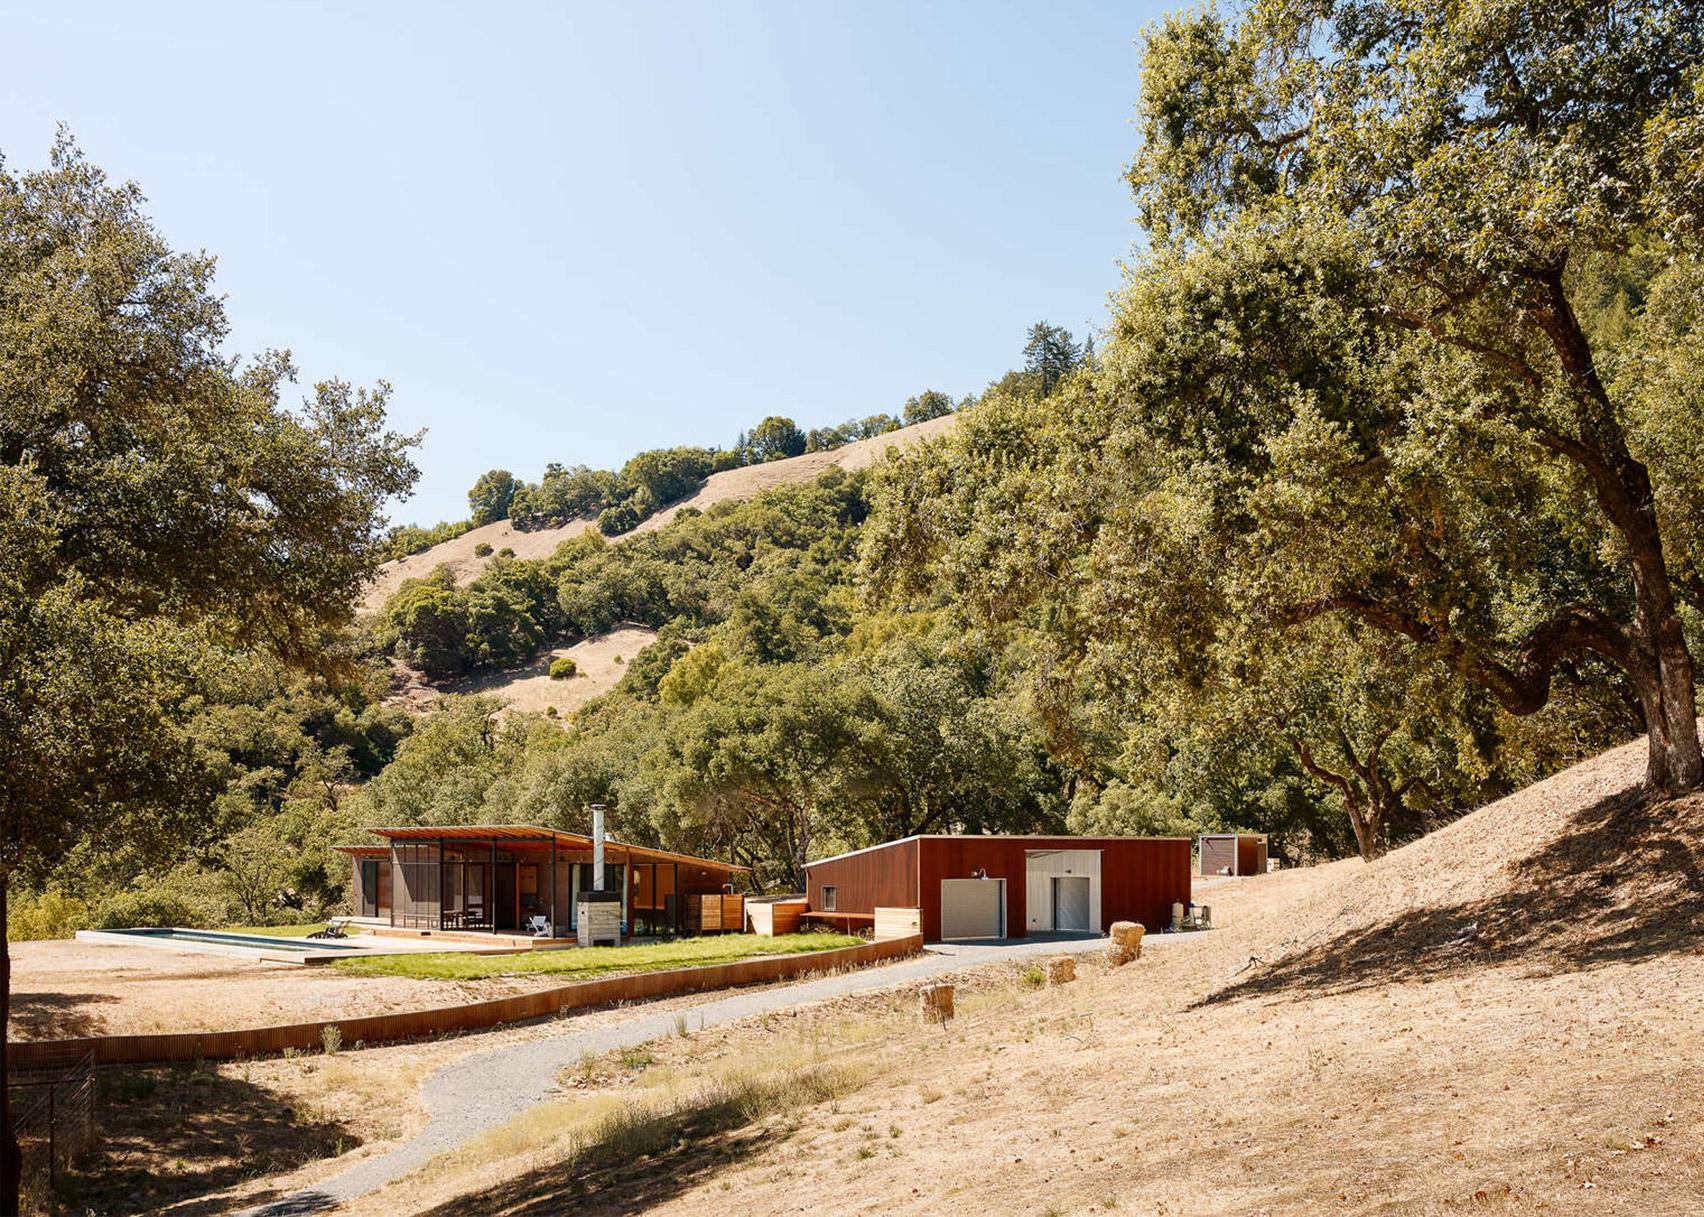 Camp Baird by Malcom Davis